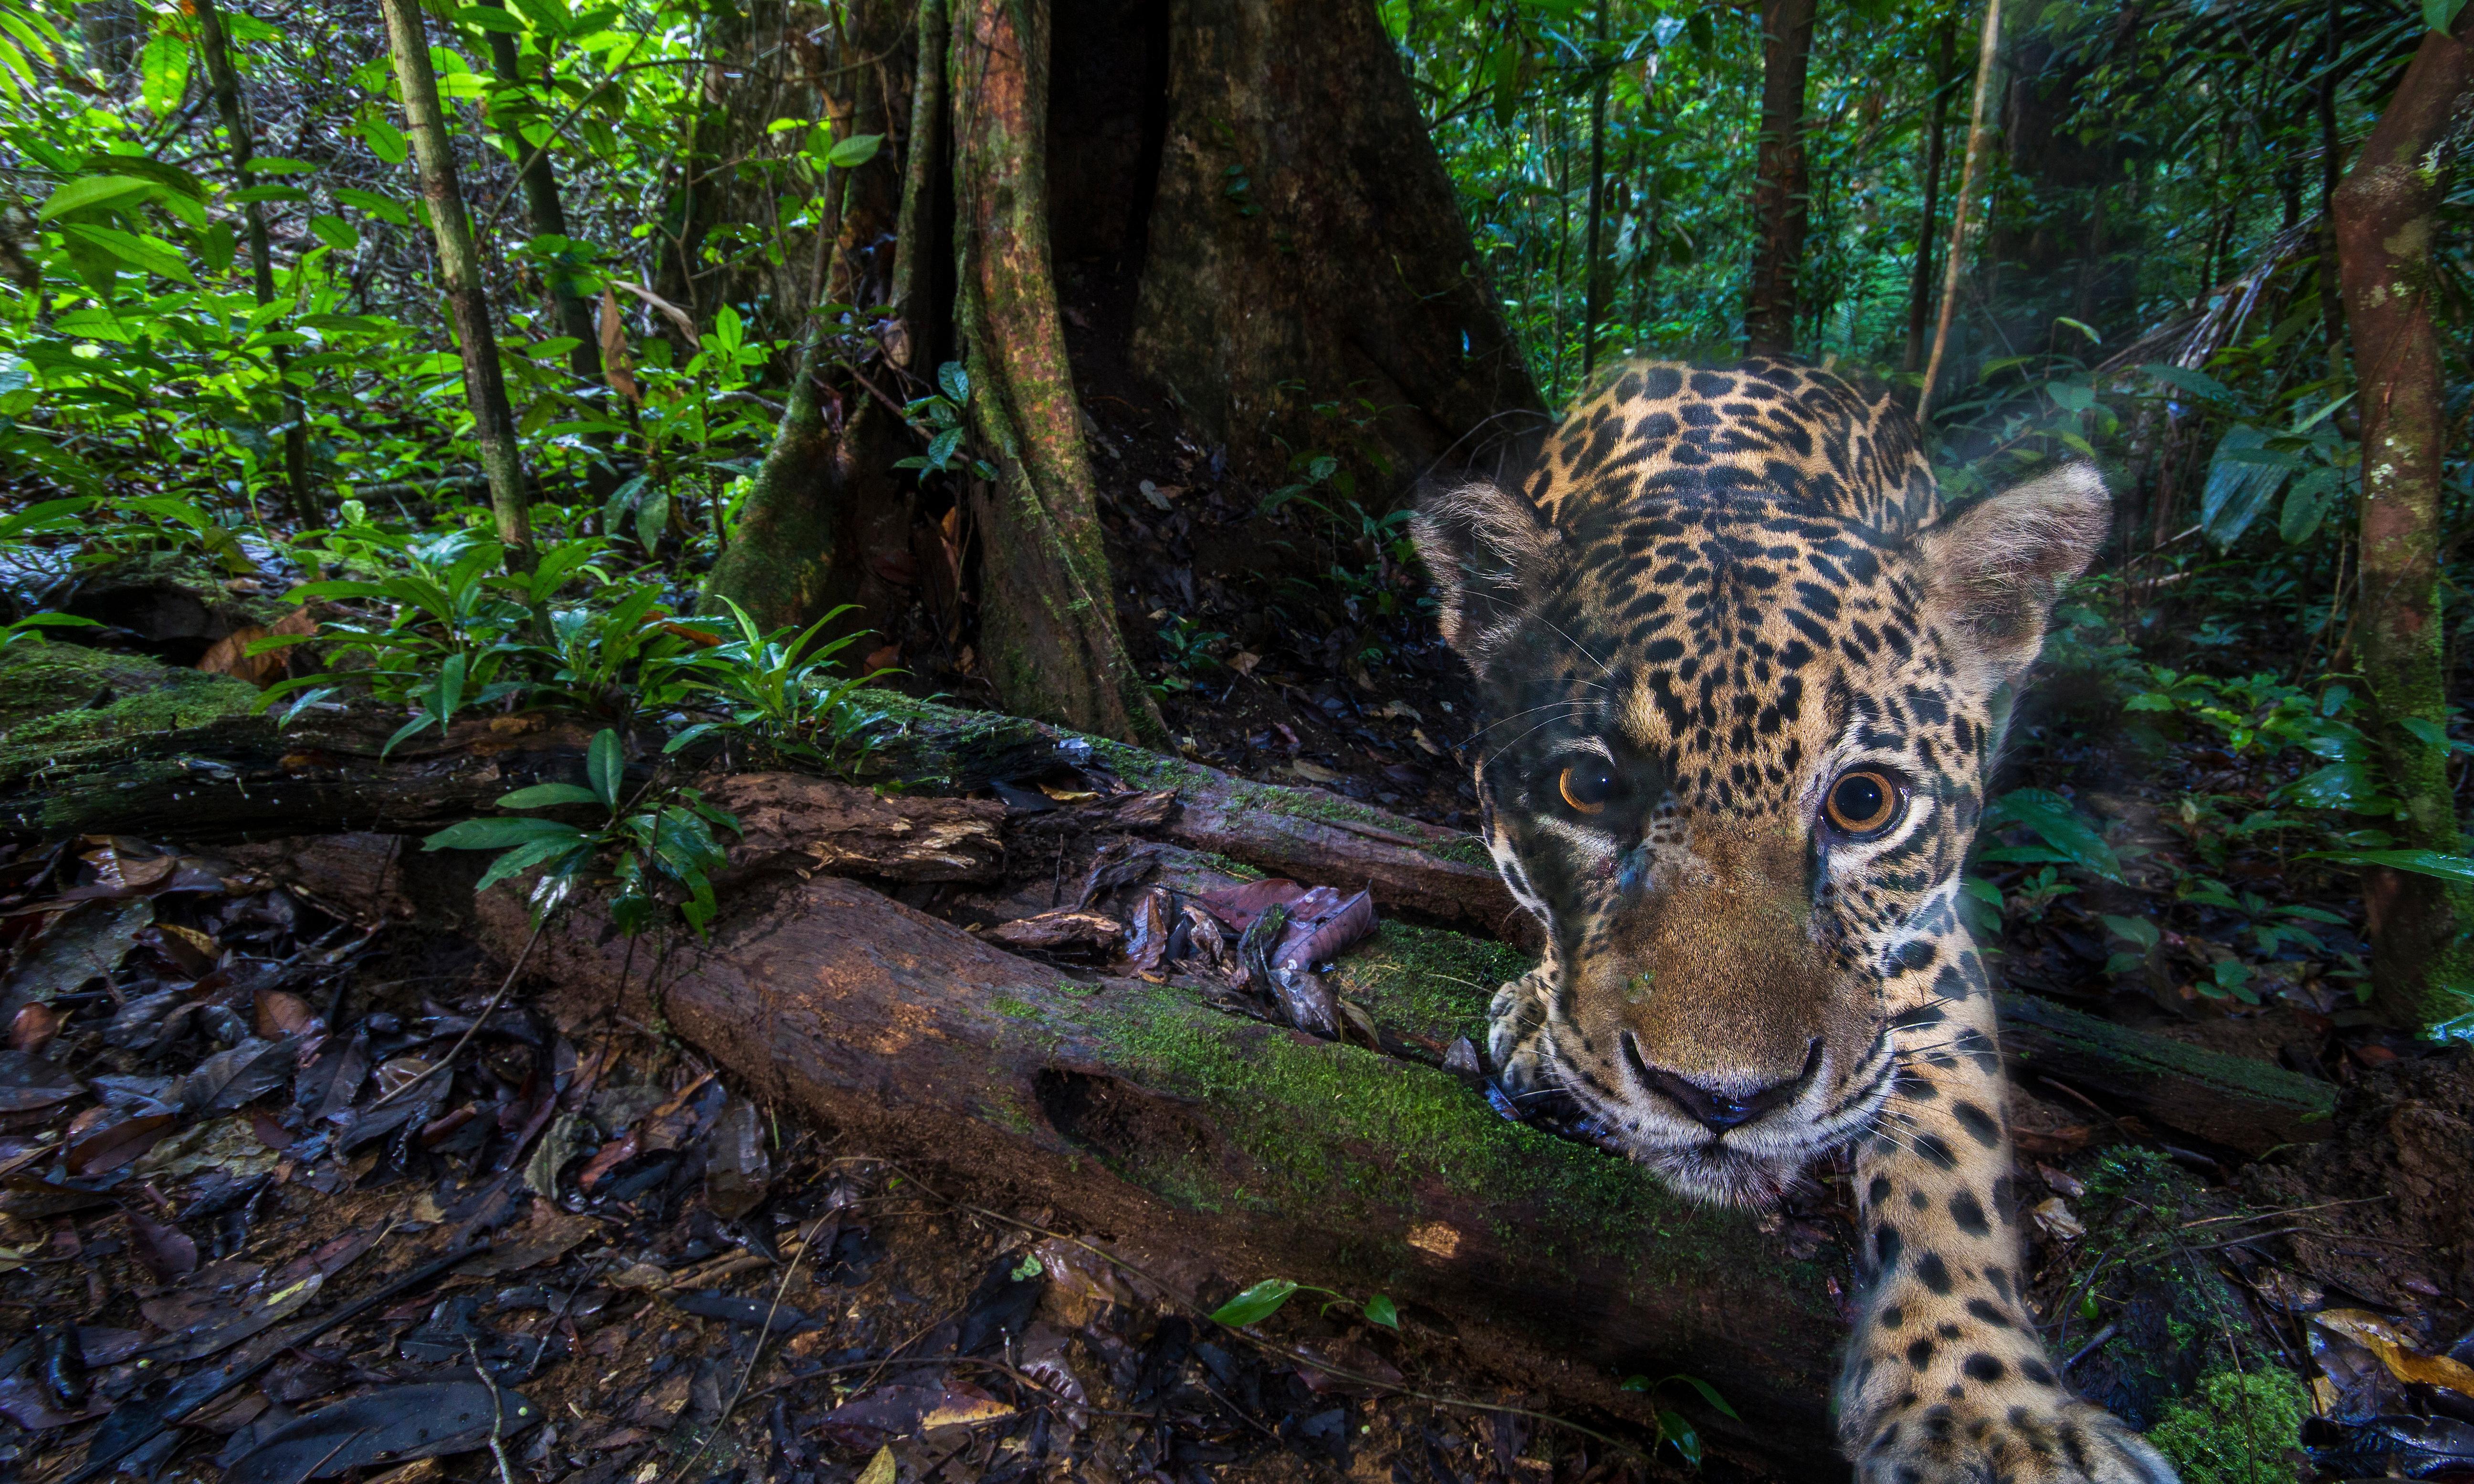 Ecuador's vanishing jaguars: the big cat vital to rainforest survival